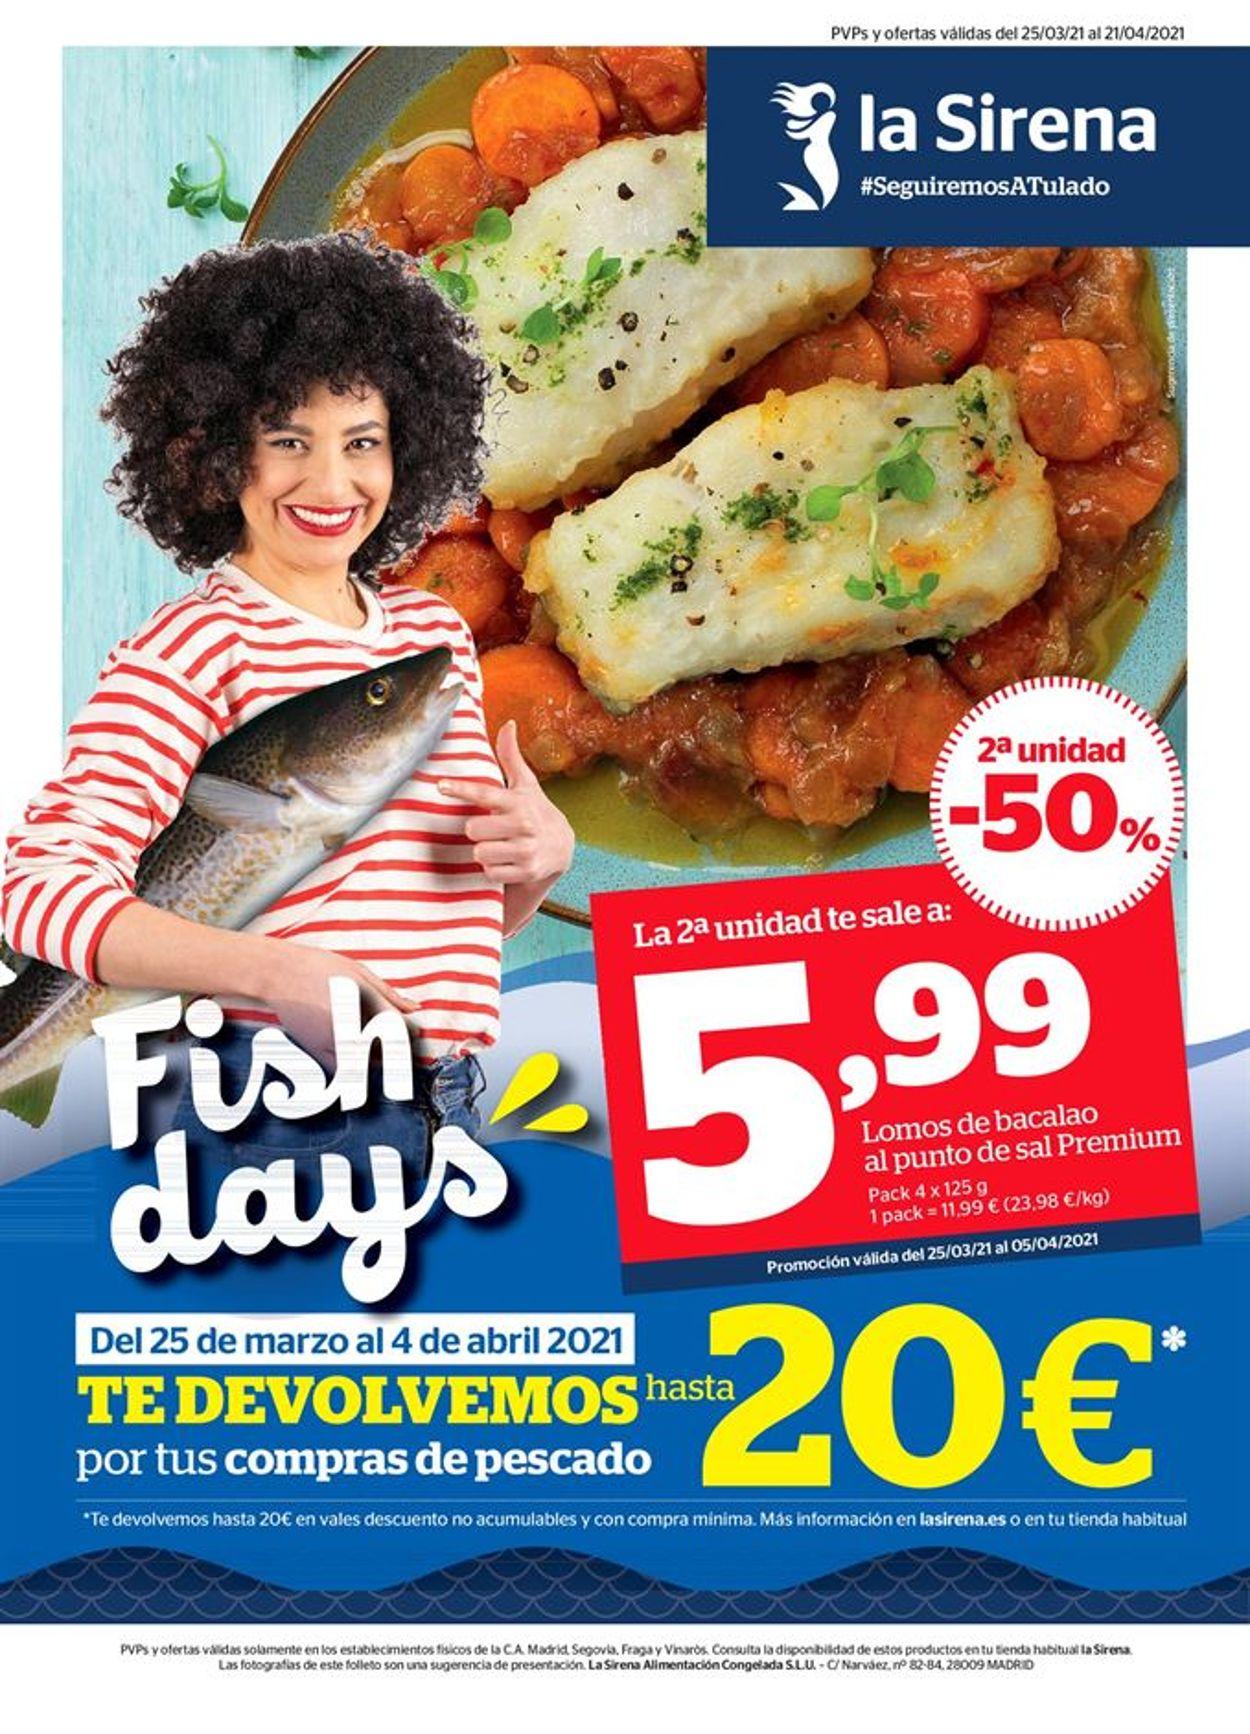 La Sirena Fish days Folleto - 25.03-21.04.2021